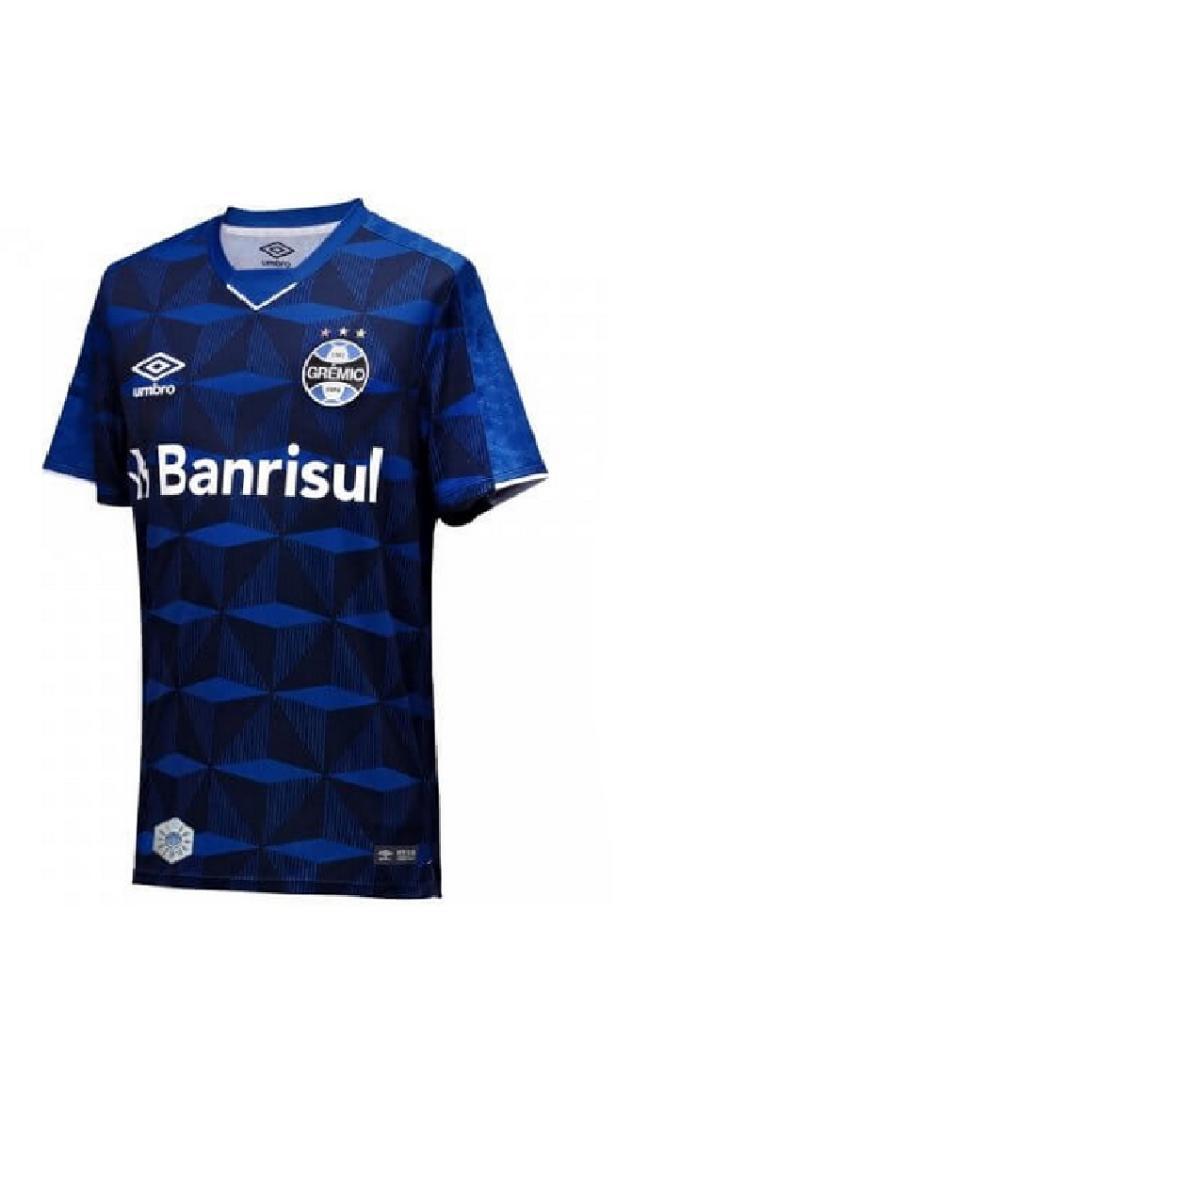 Camiseta Masculina Grêmio 3g160988 of 3 2019 Classic Marinho/branco